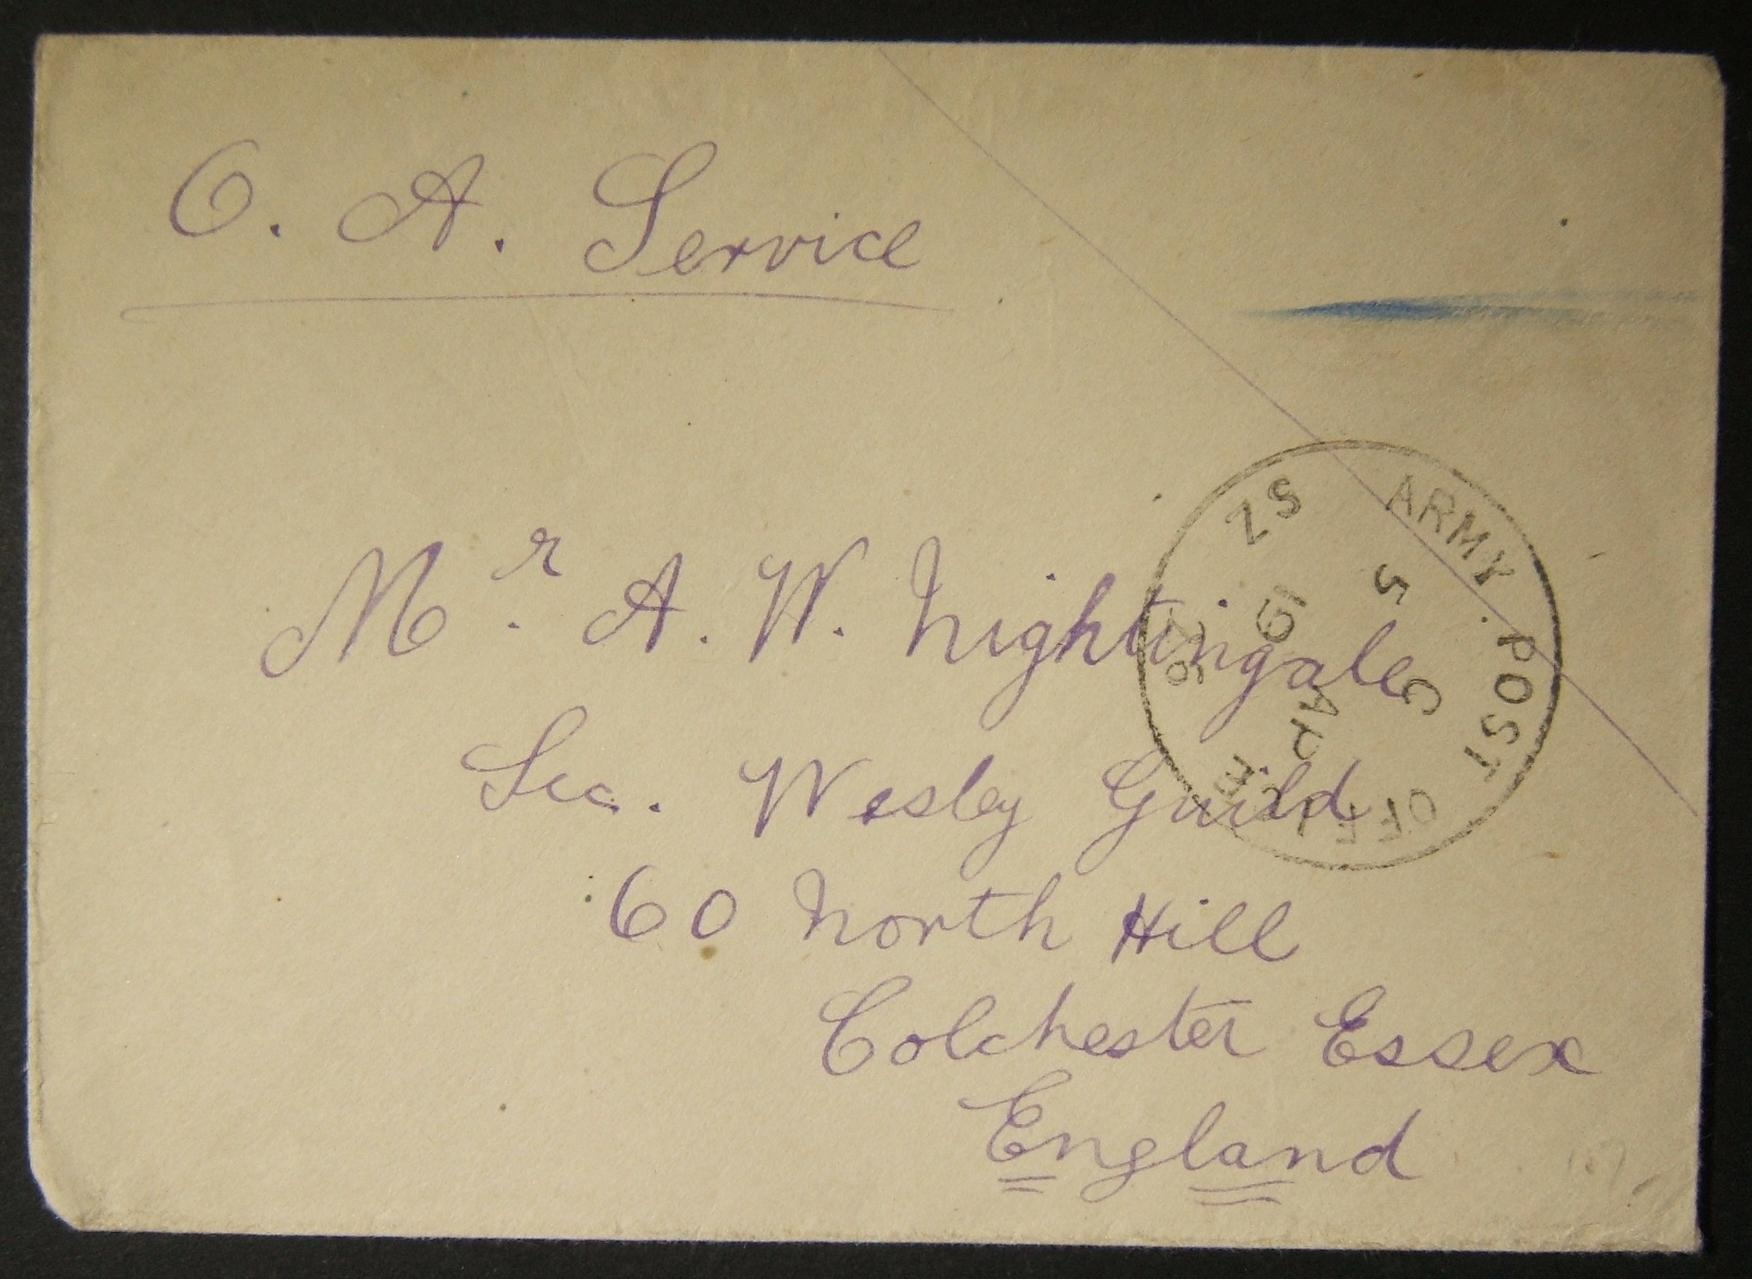 4/1919 WWI מצרים דואר צבאי בריטי עם APO SZ 26 חותמת דואר ביום 1 של שימוש